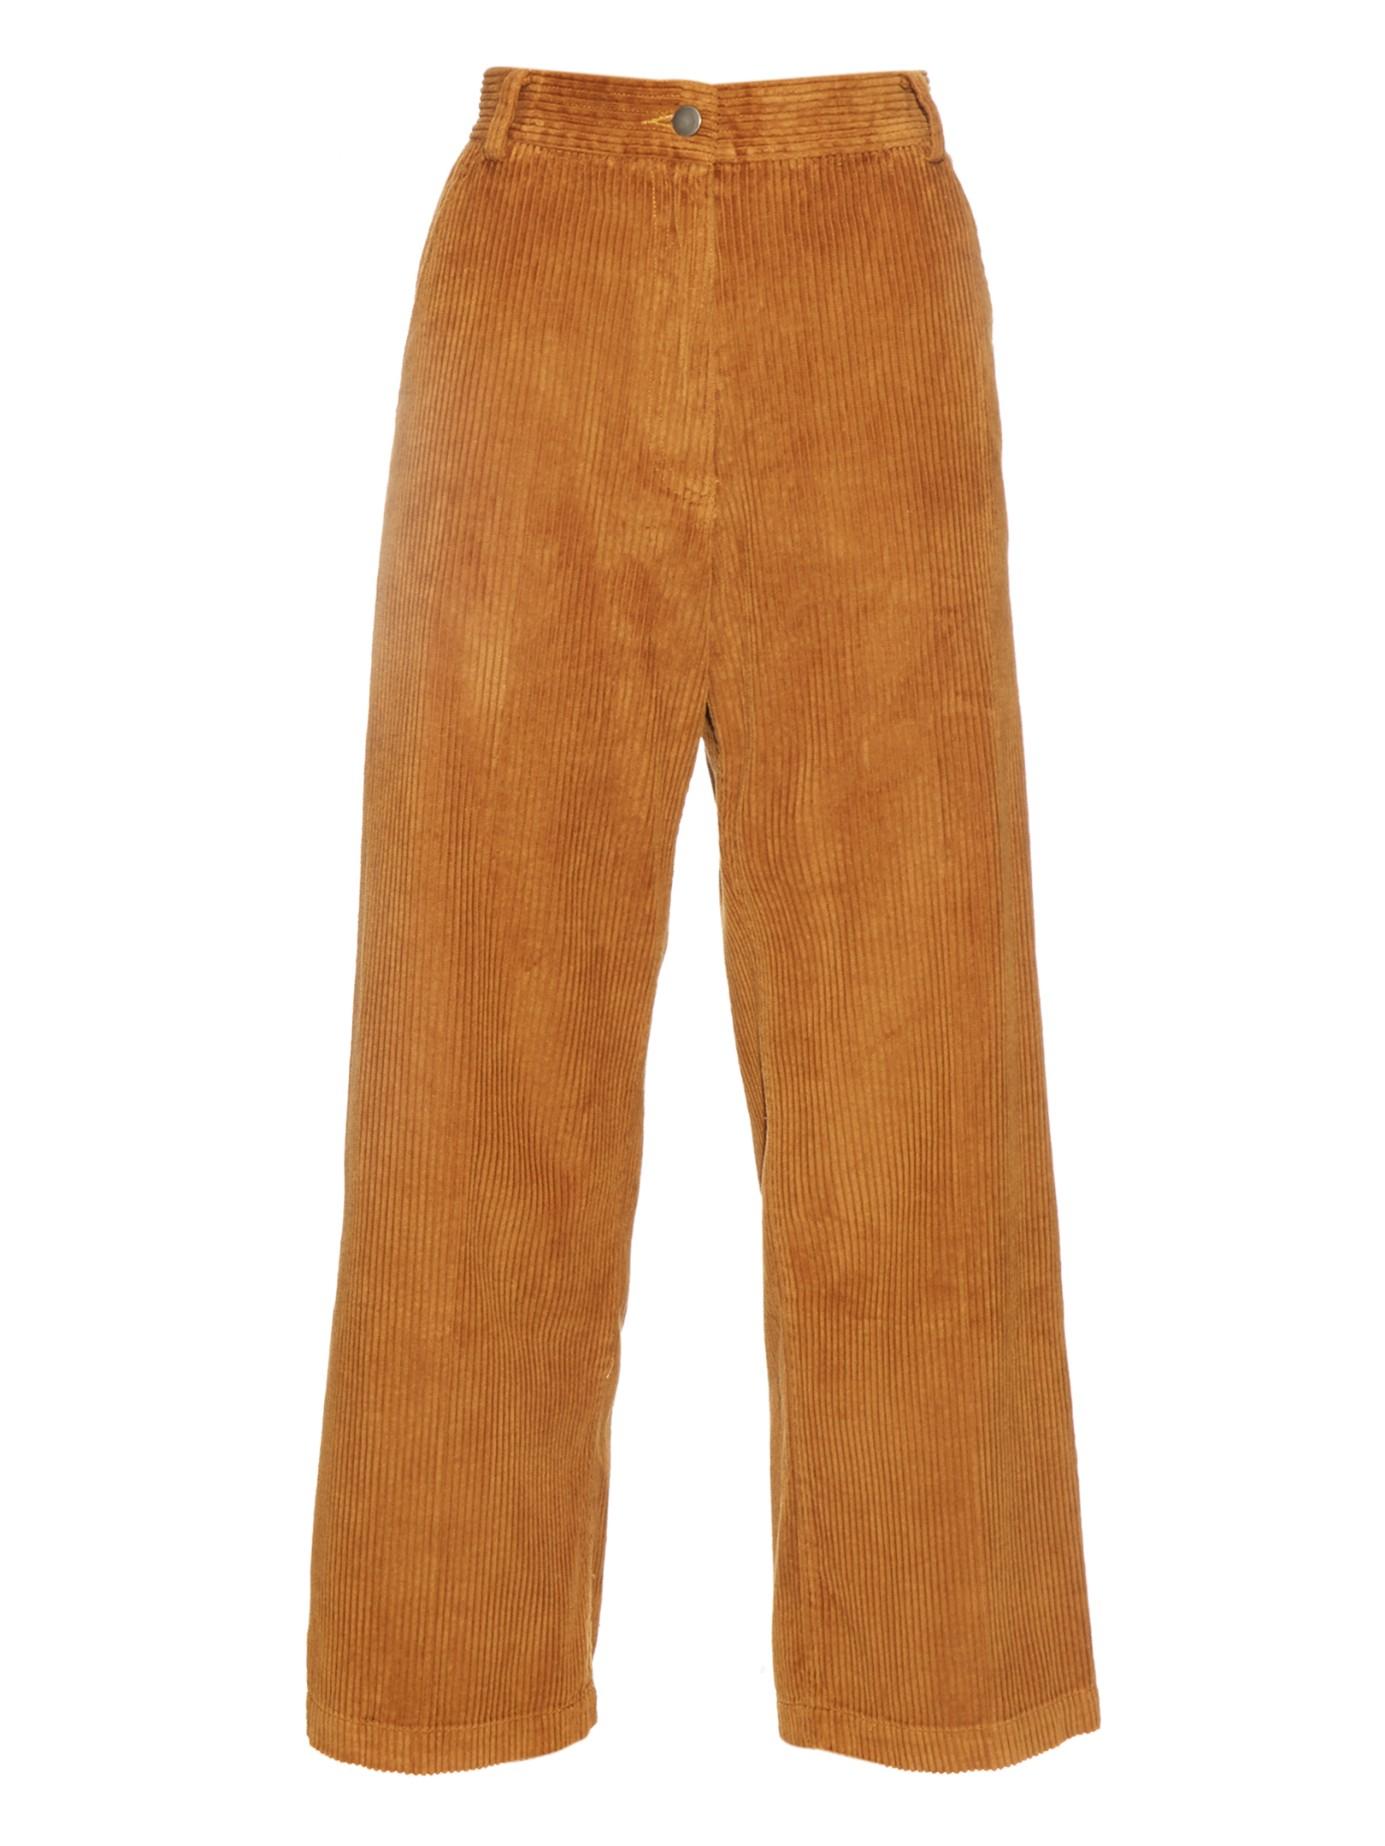 Rachel comey Bishop Wide Wale Corduroy Trousers in Brown ...